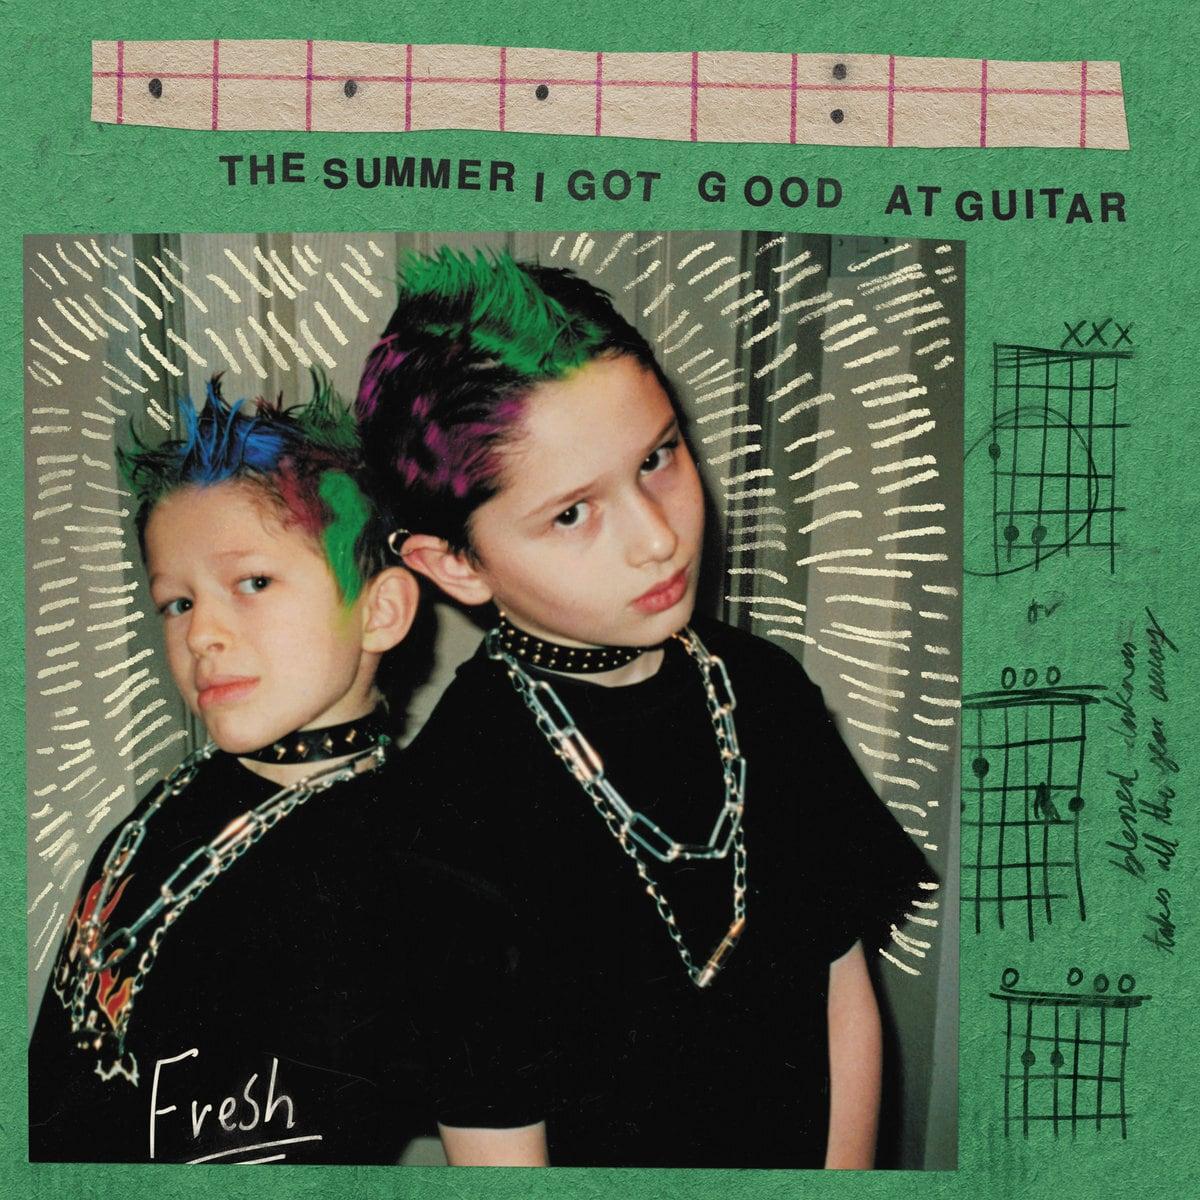 Fresh / The Summer I Got Good At Guitar(500 Ltd 12inch EP)